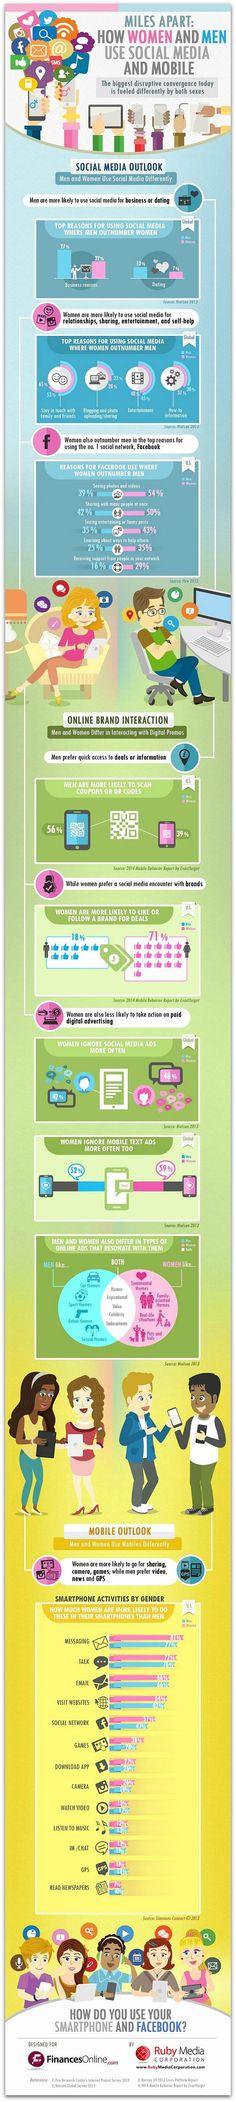 How men and women use social media << For social media strategy, training, management, and engagement, contact HugSpeak today! http://www.hugspeak.com/social-media-marketing/